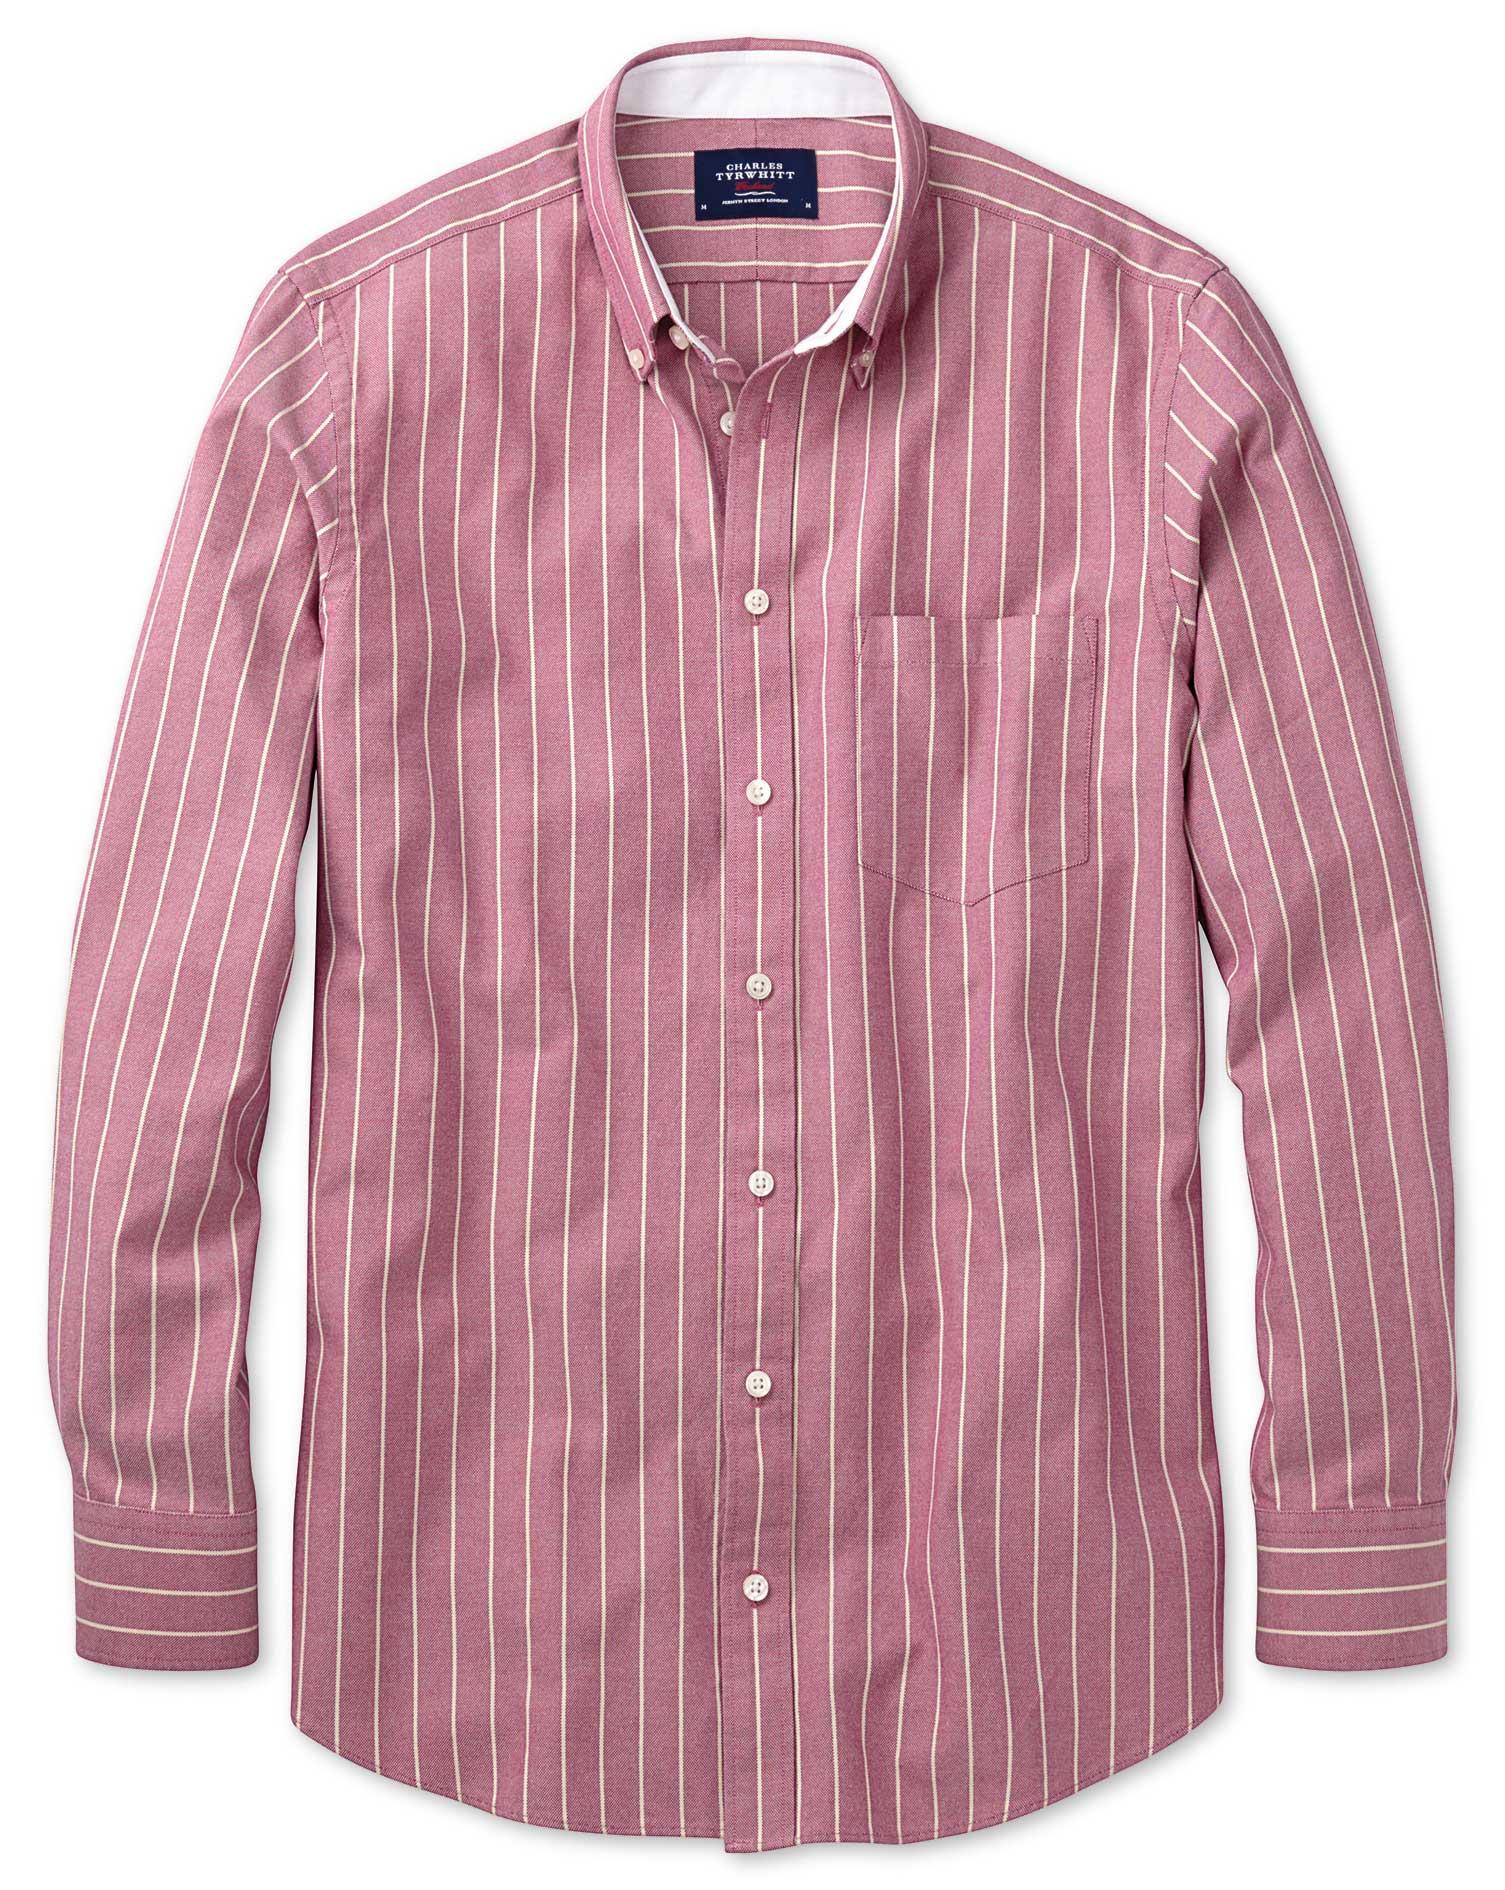 Extra Slim Fit Magenta Stripe Washed Oxford Cotton Shirt Single Cuff Size Medium by Charles Tyrwhitt